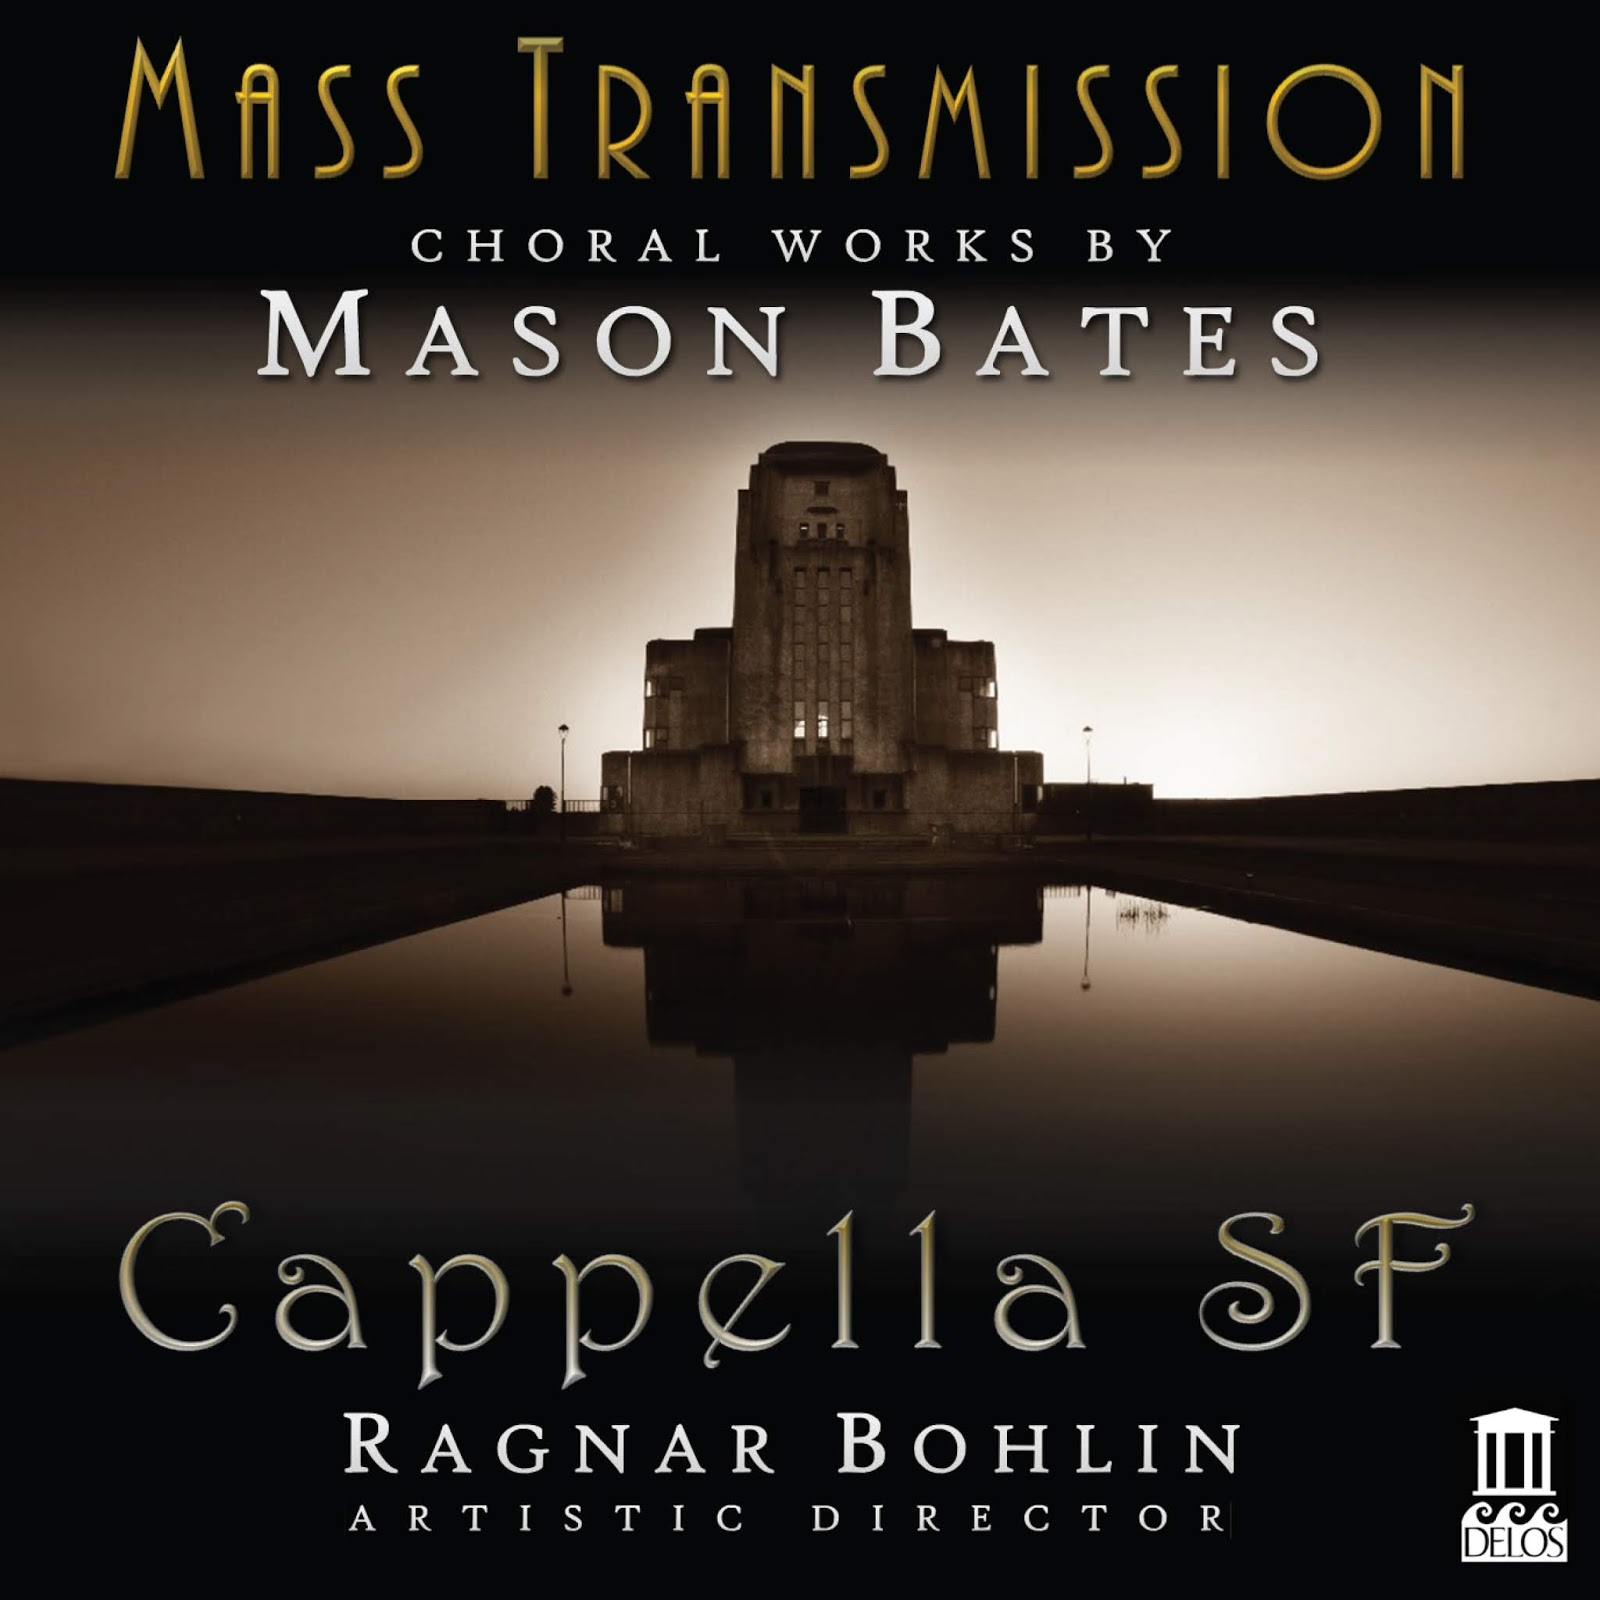 IN REVIEW: Mason Bates - MASS TRANSMISSION (Delos 3573)